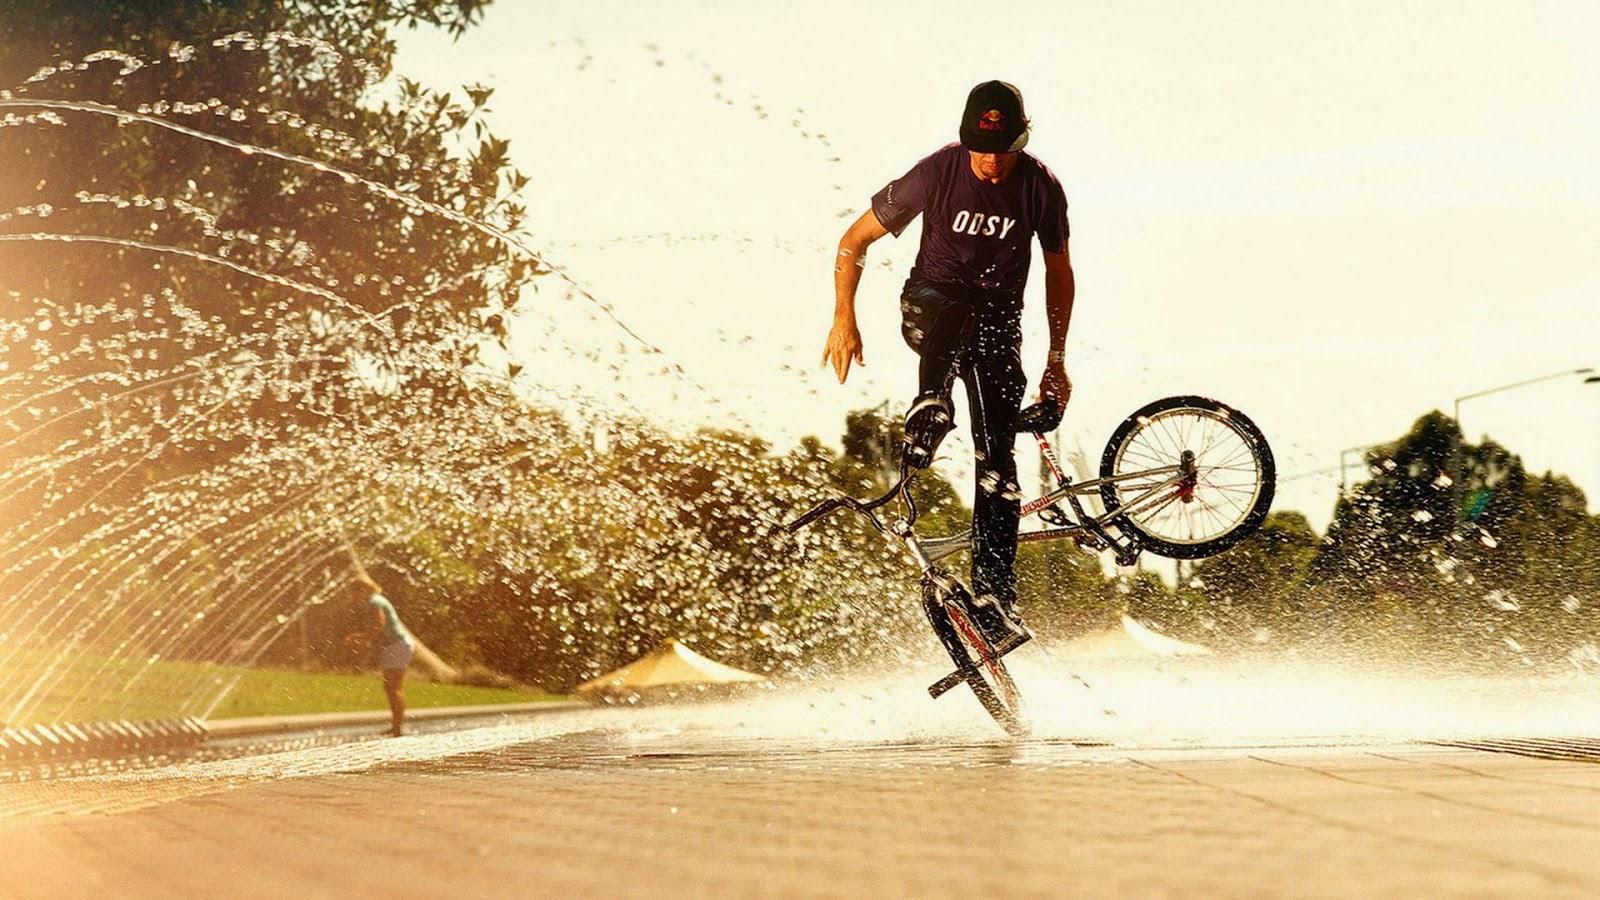 Bmx Bike Freestyle HD Wallpapers | HD Wallpapers